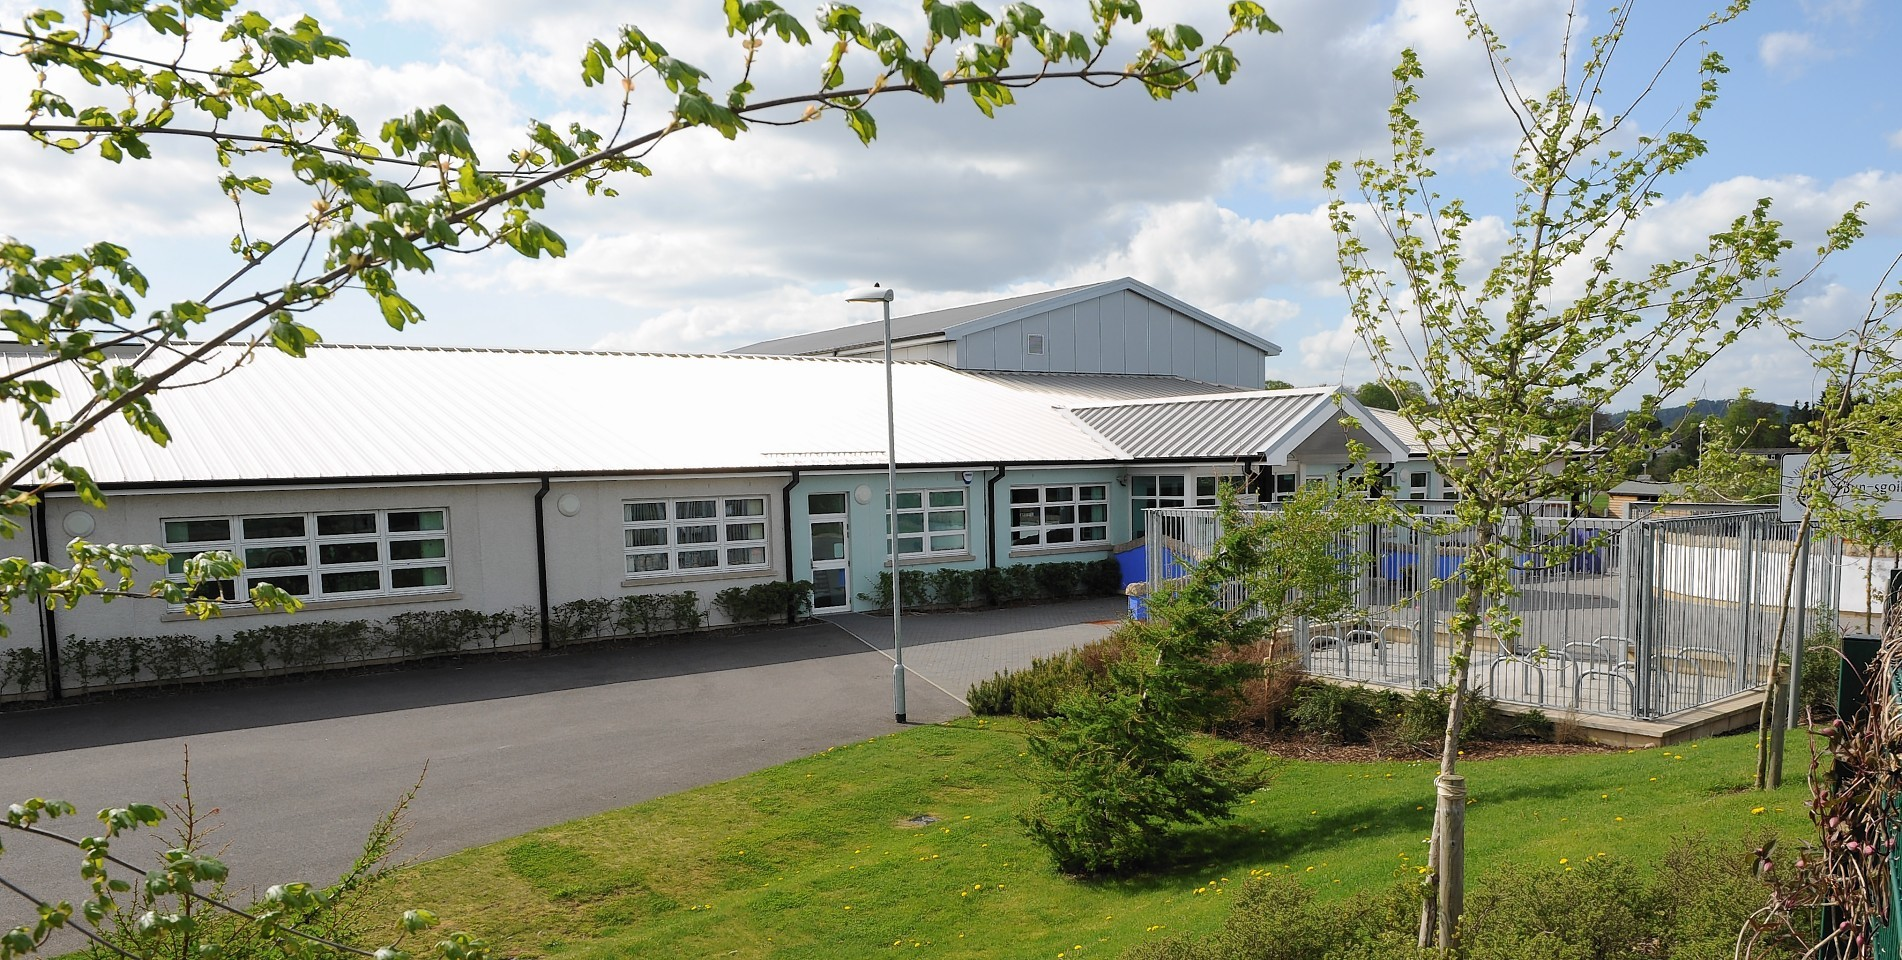 Inverness Gaelic School